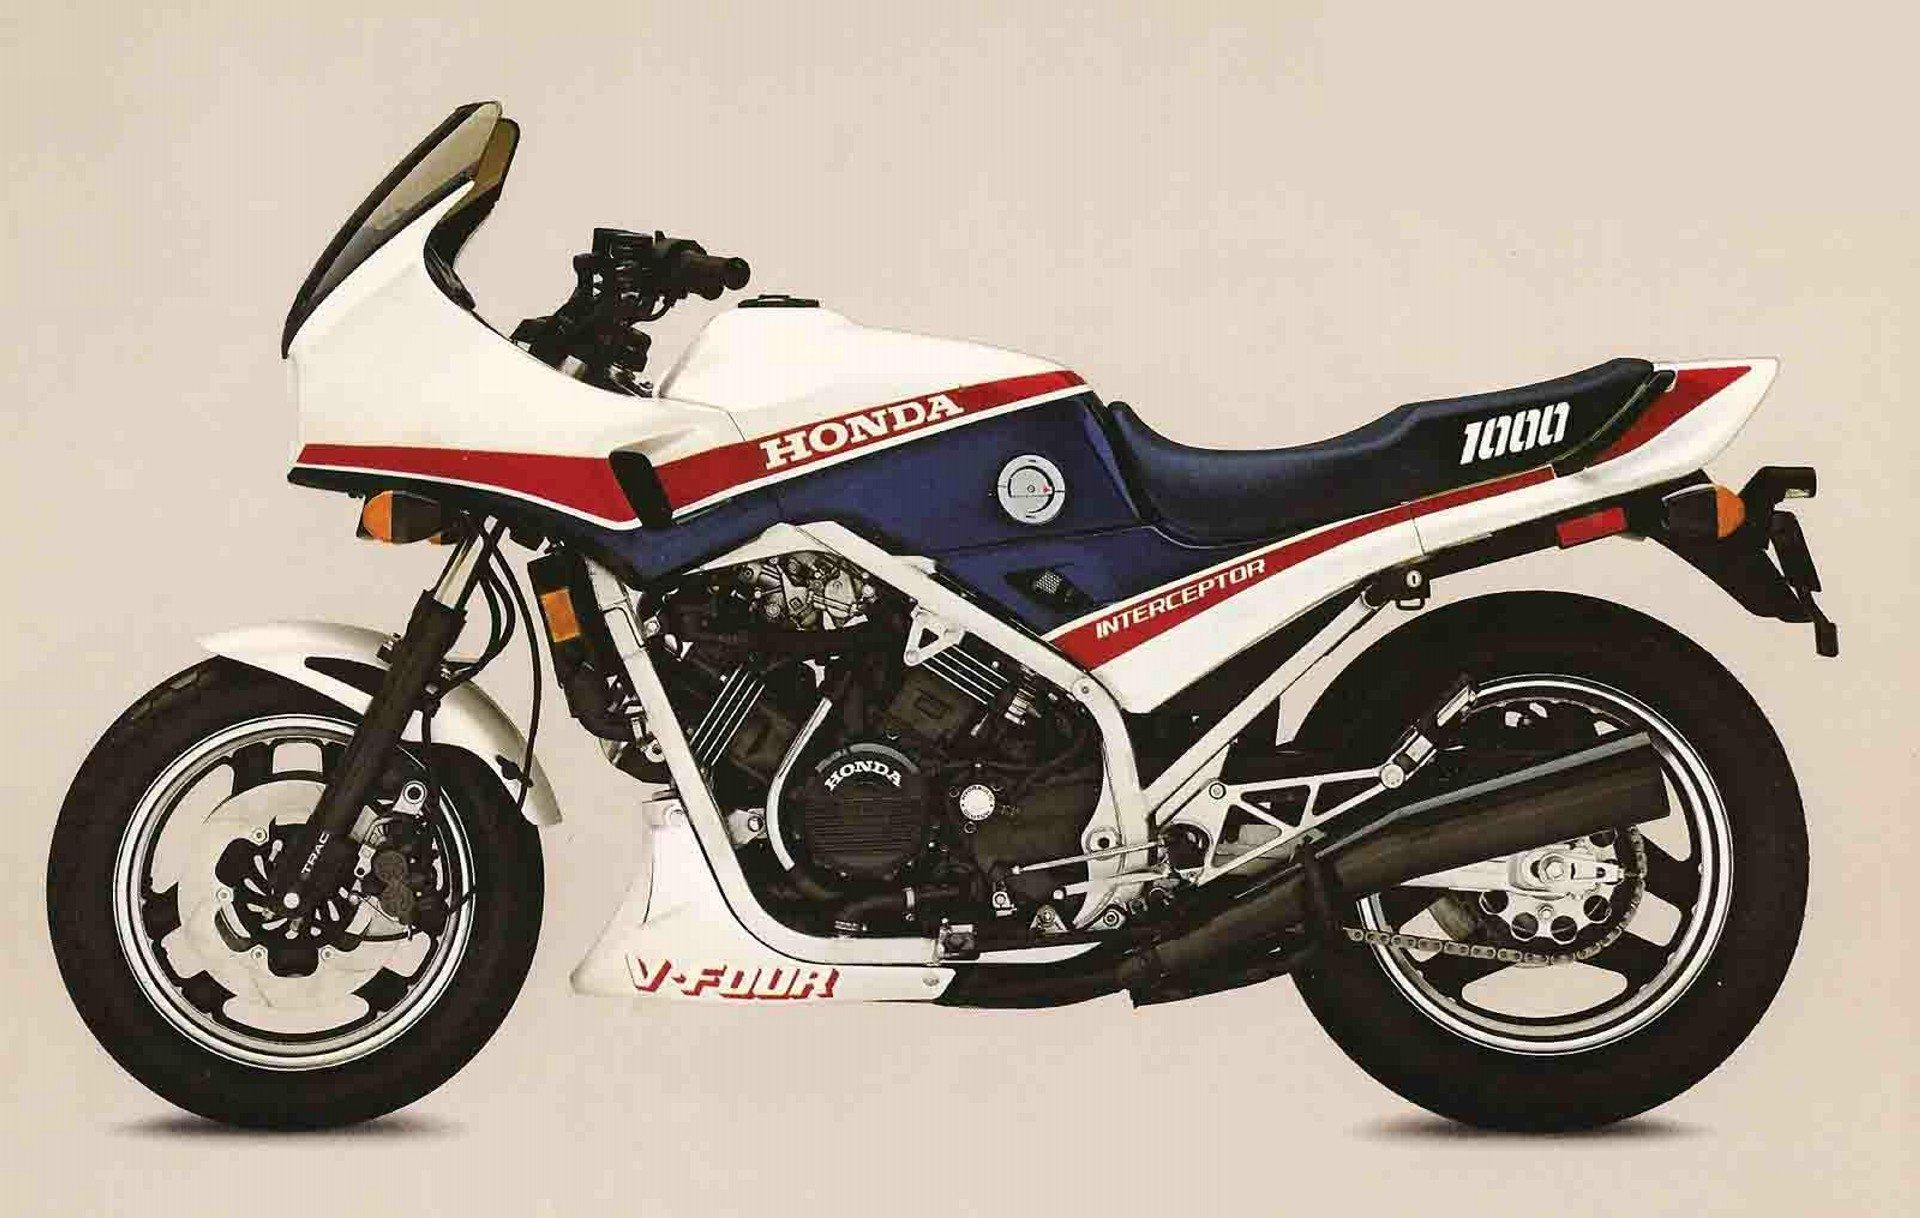 Moto del día: PGM V8 | espíritu RACER moto